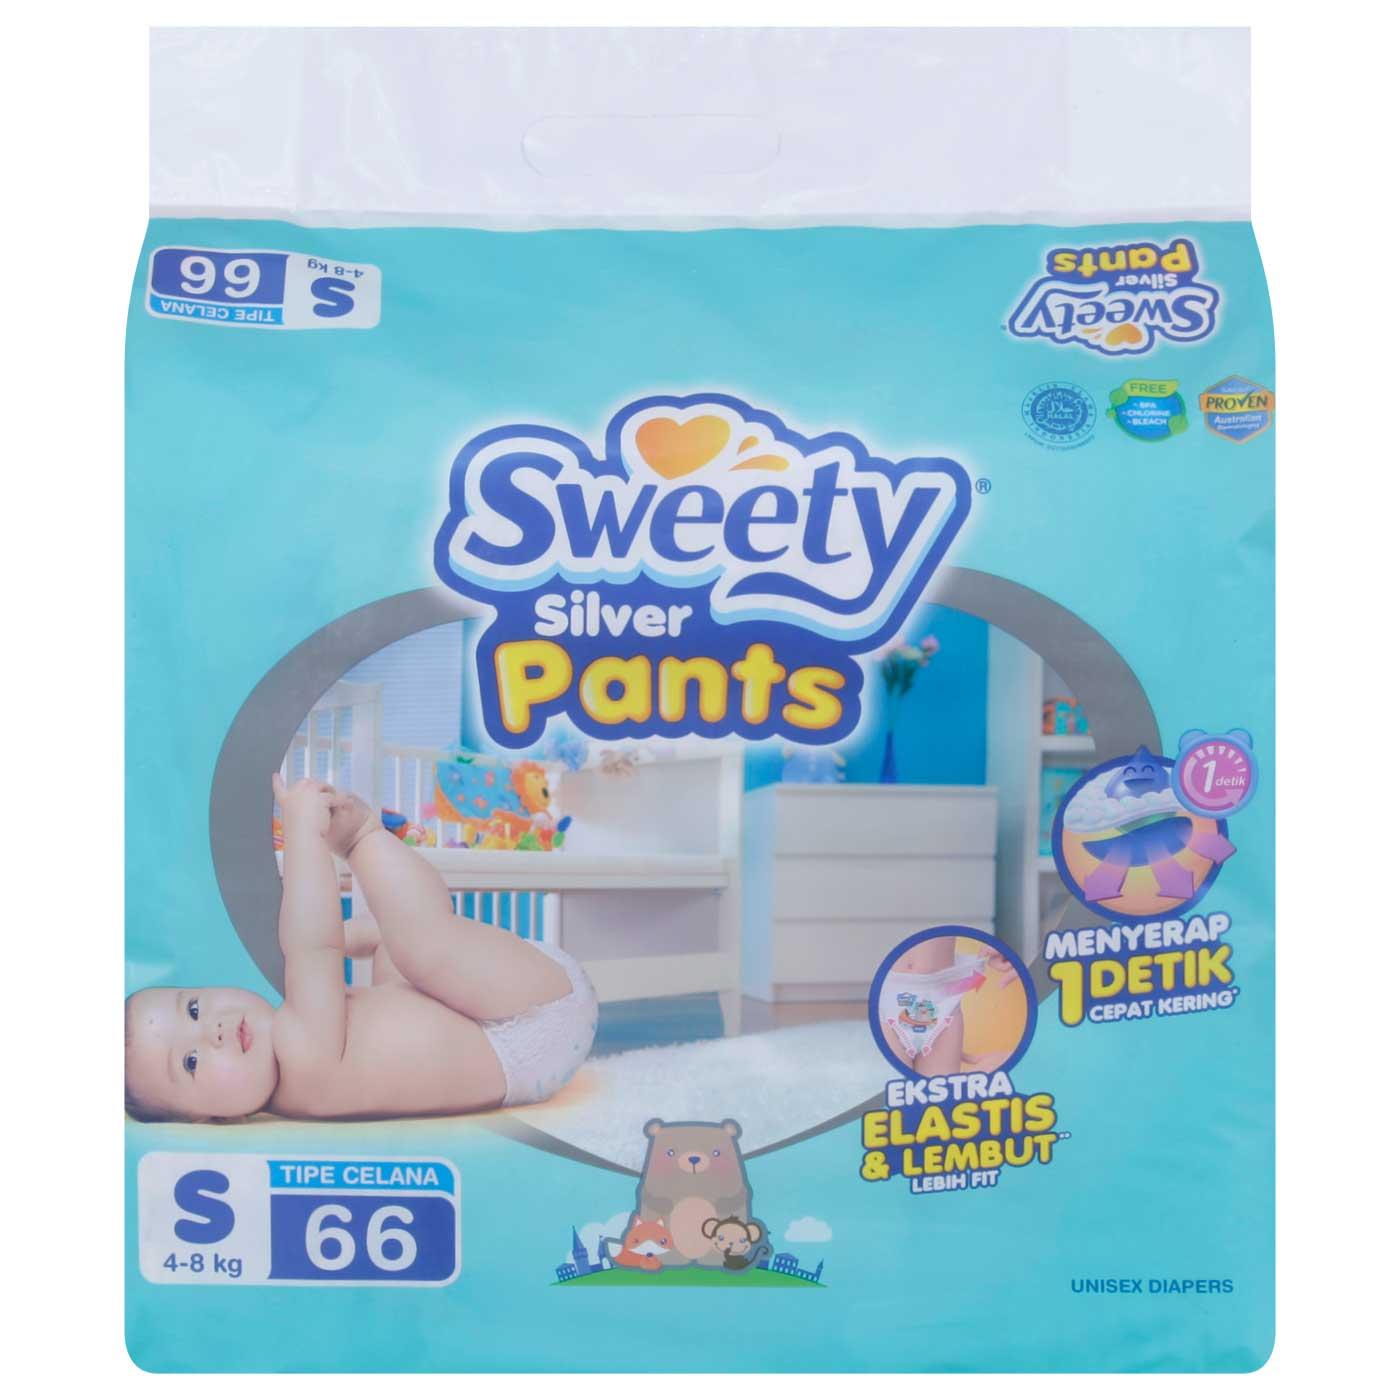 Sweety Silver Pants S 66's